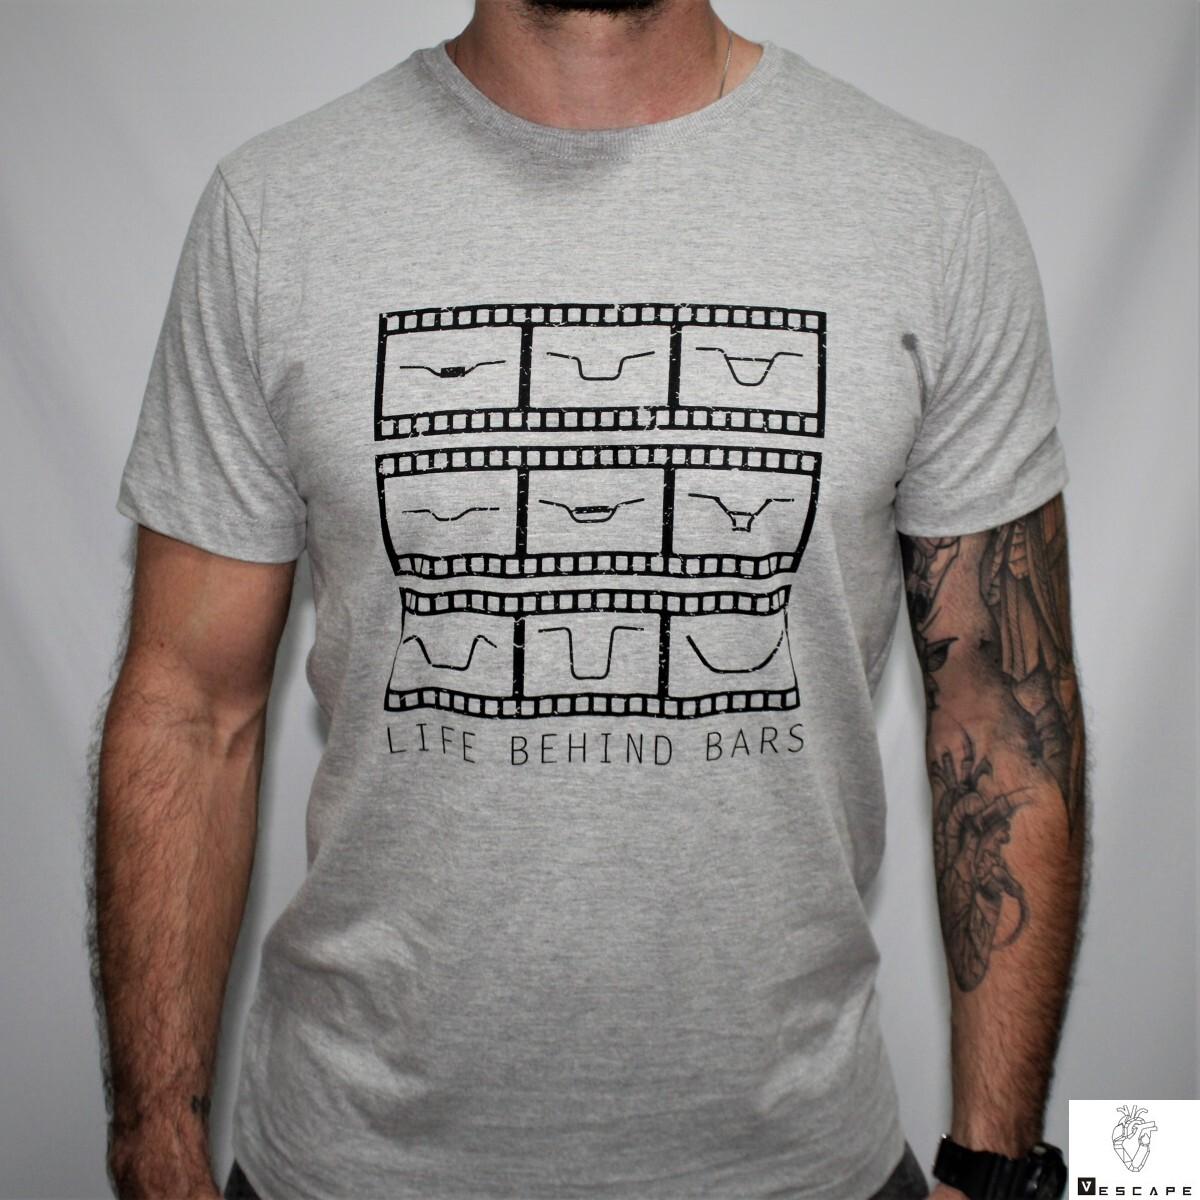 Foto2 - Camisa Life Behind Bars